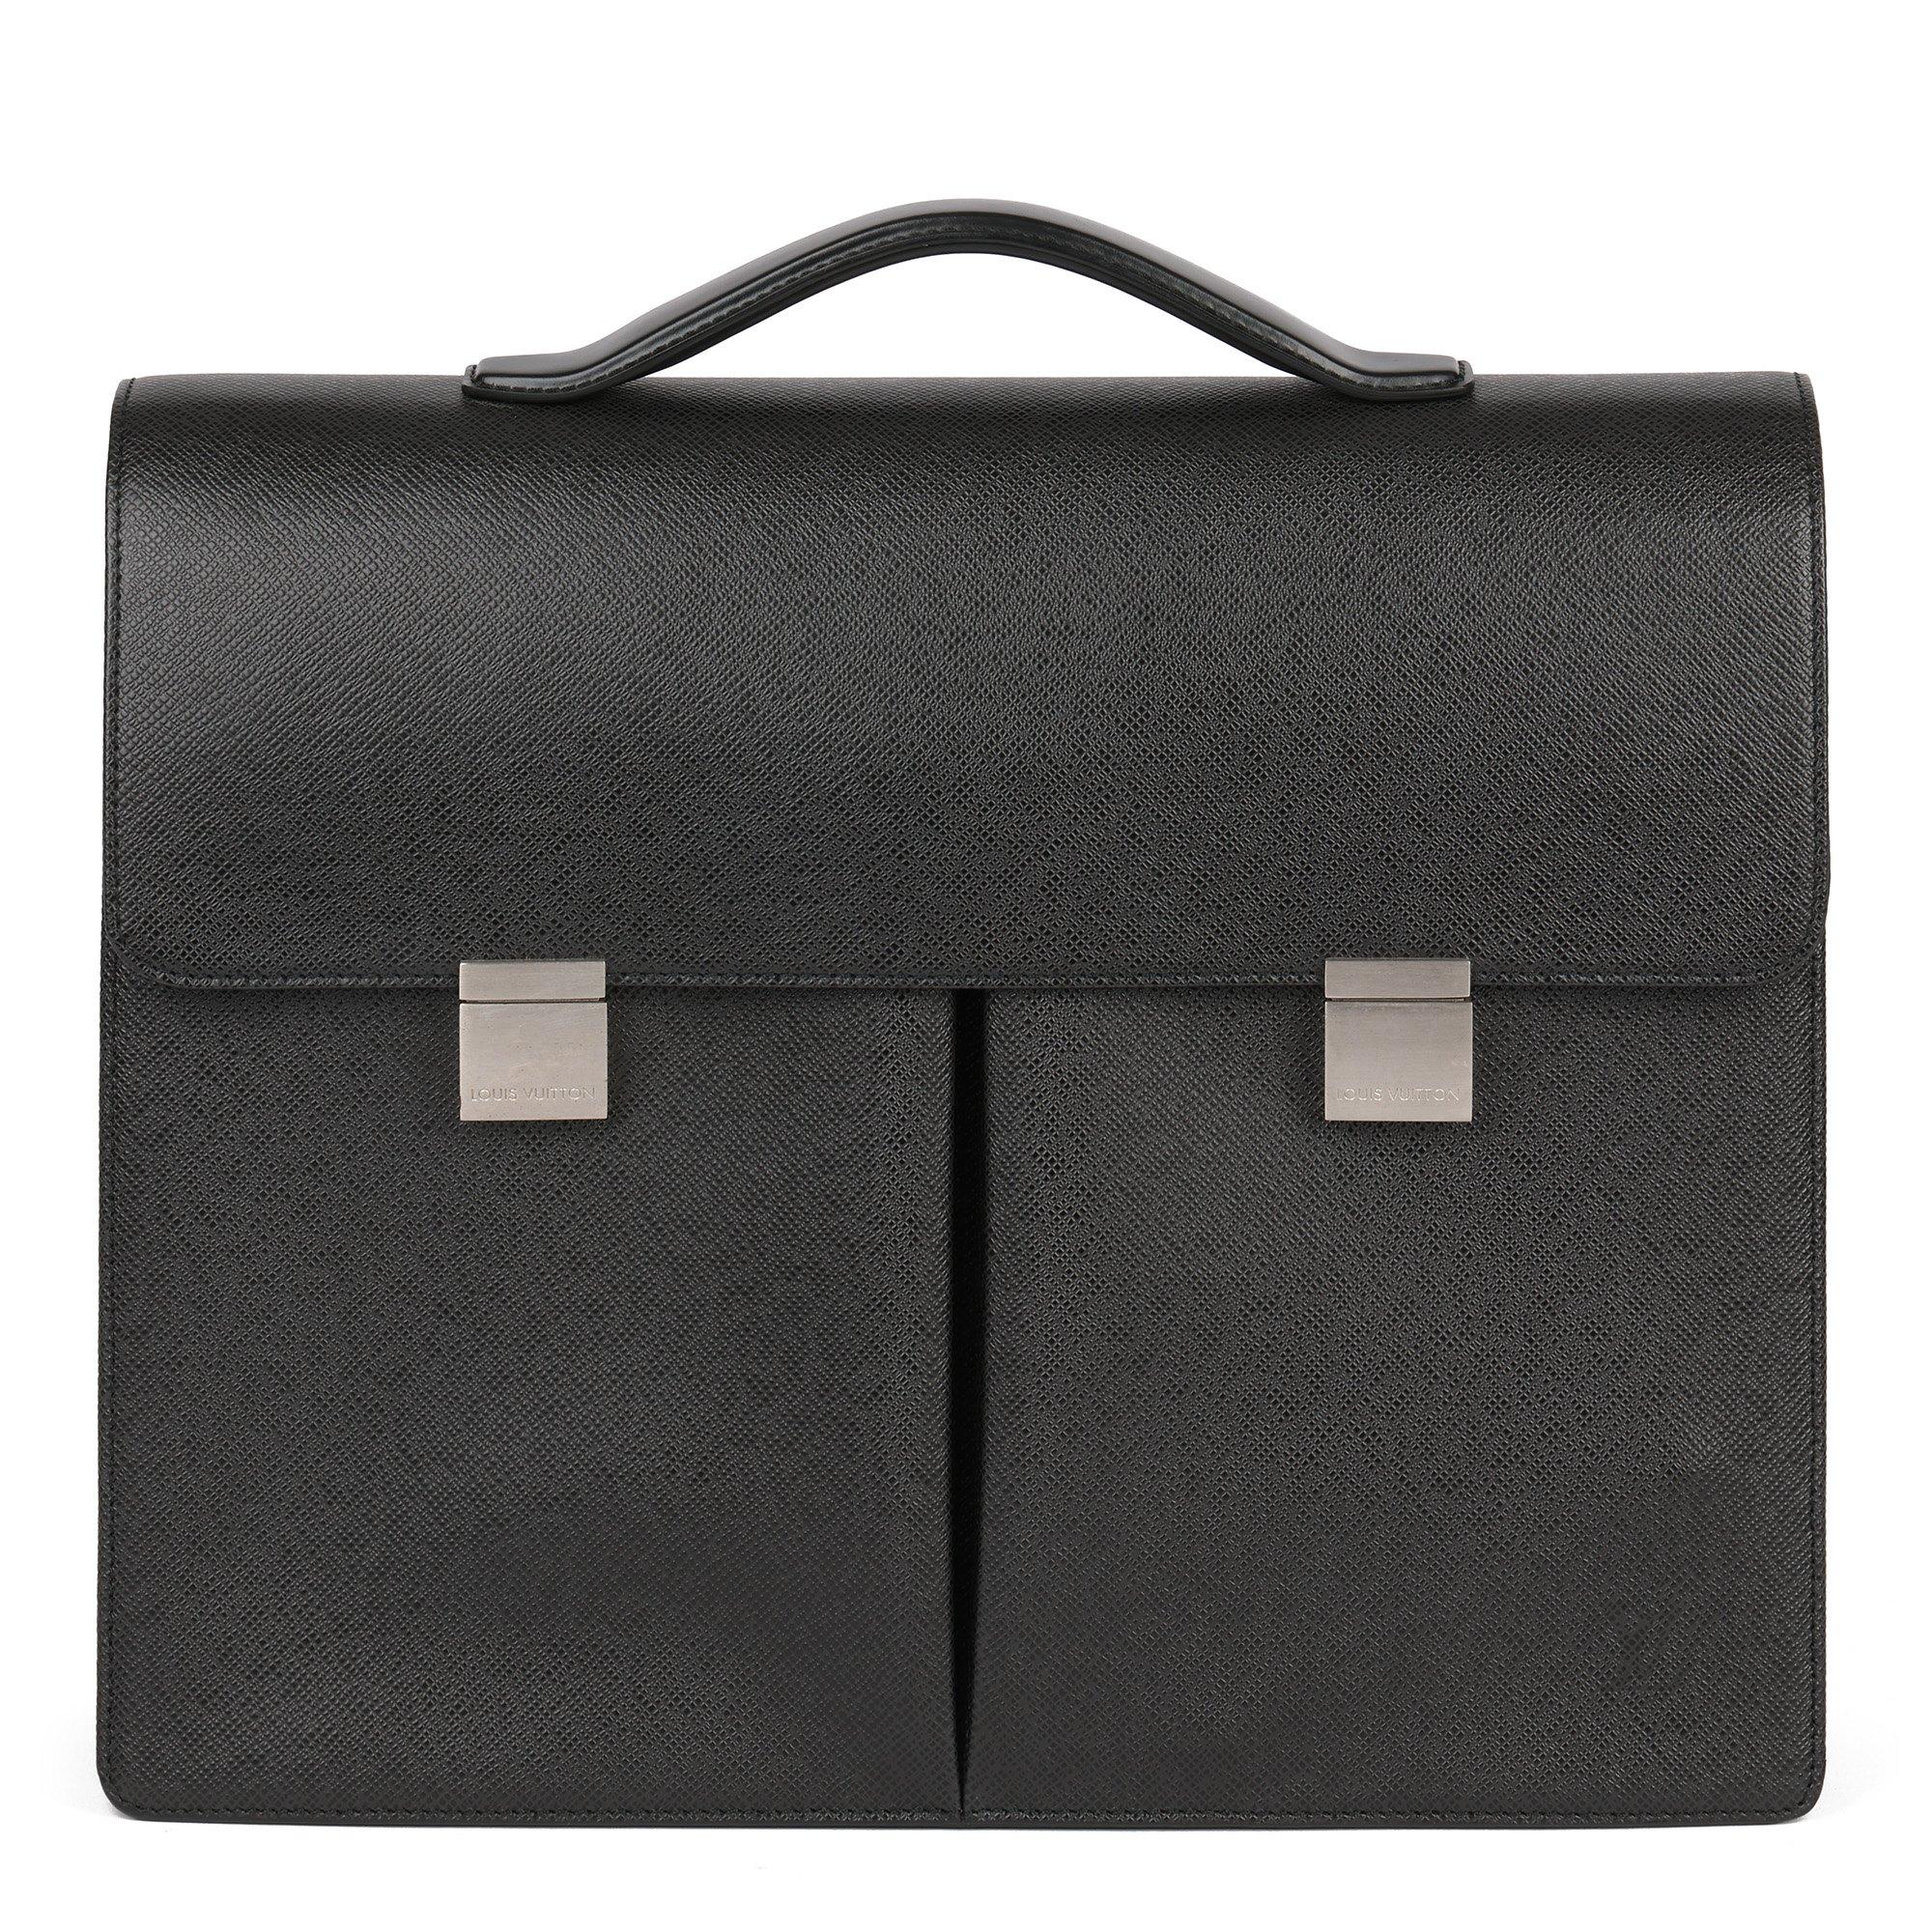 Louis Vuitton Black Taiga Leather Vintage Tobol Briefcase